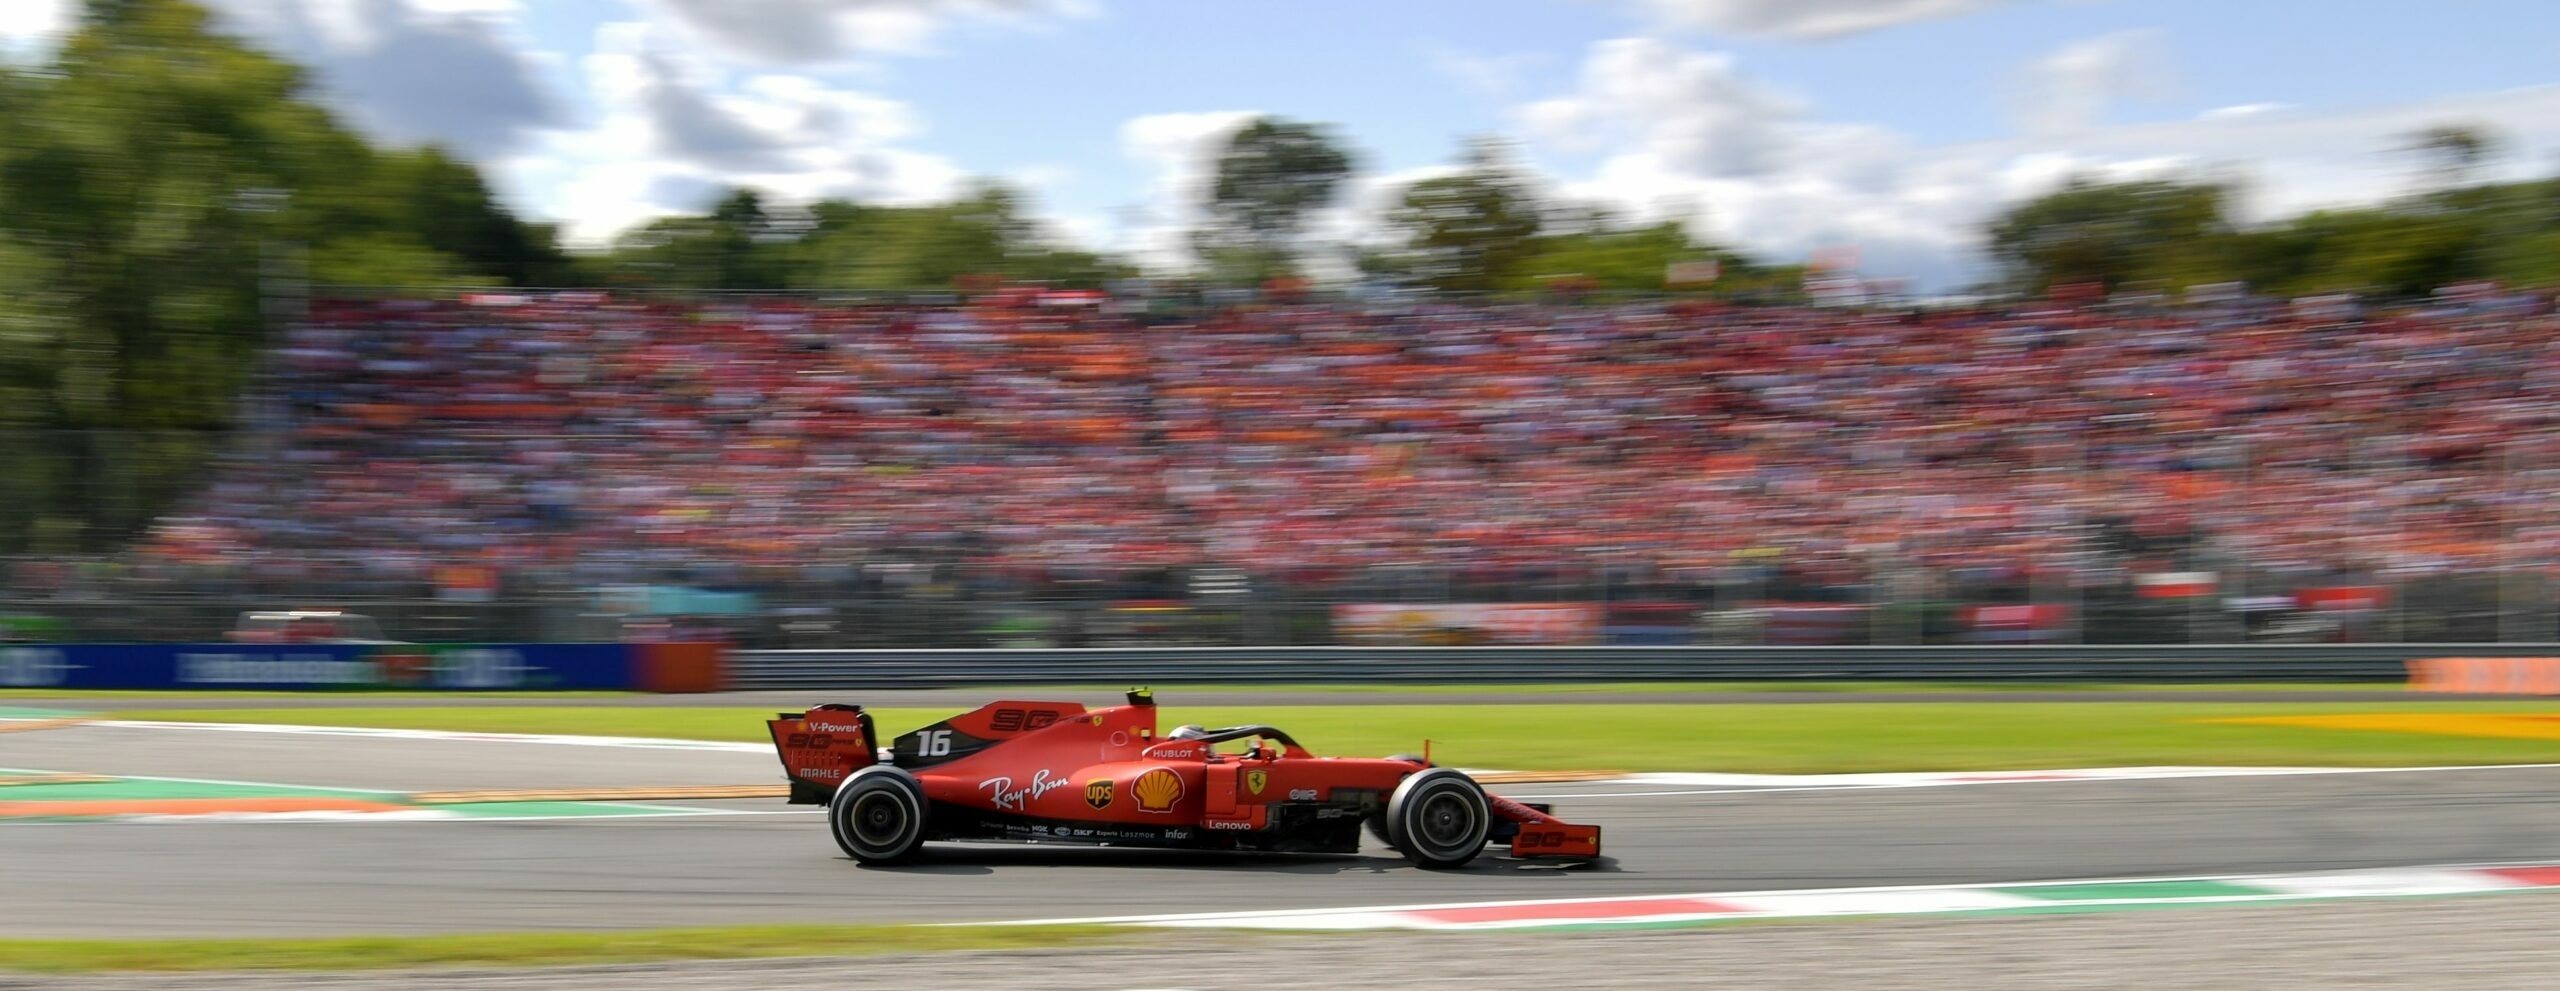 Calendario F1 2021: date e circuiti di tutti i 23 Gran Premi